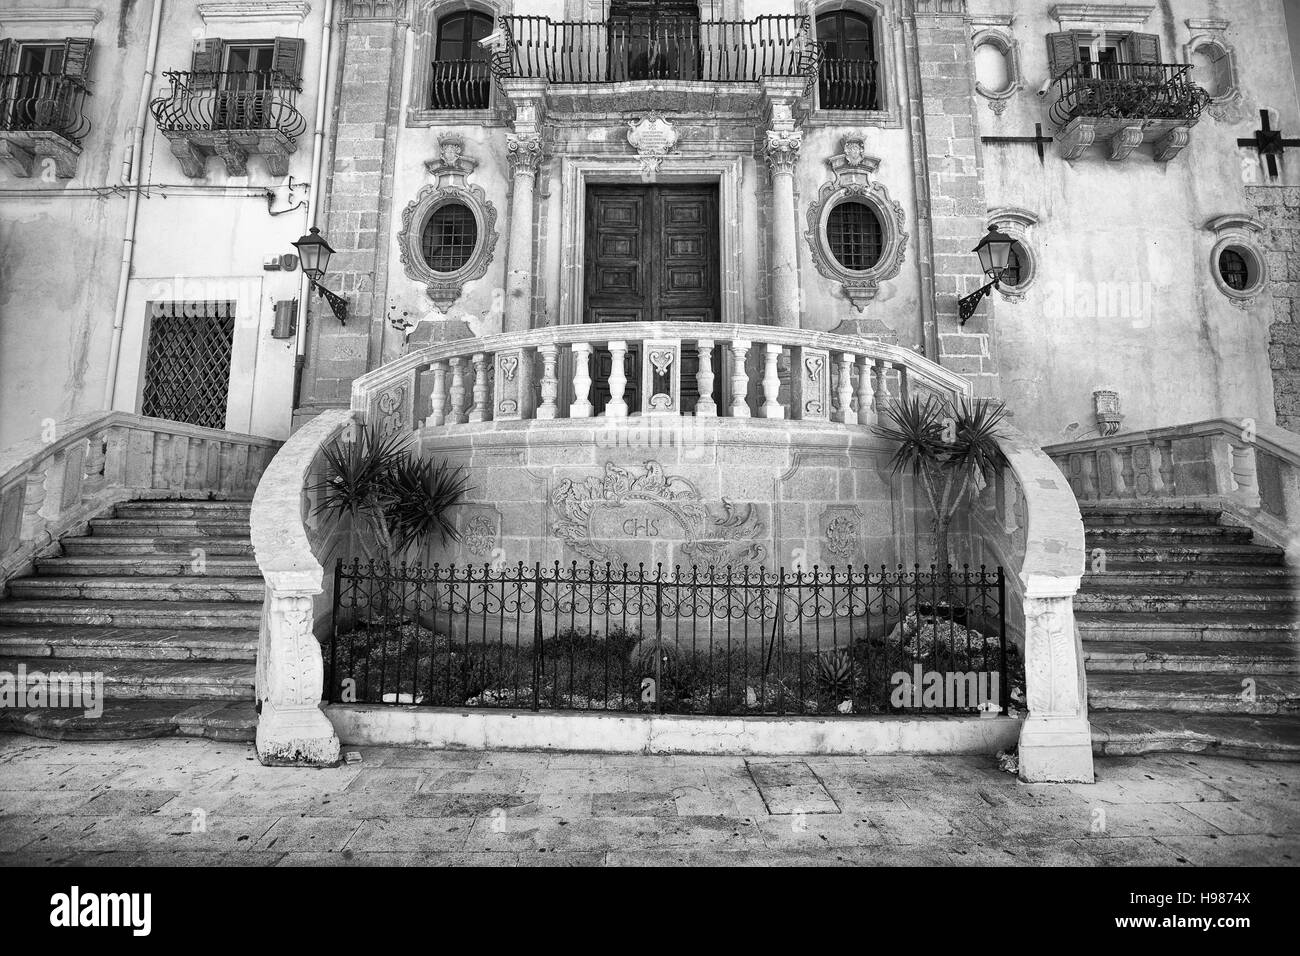 Casa & Co Milazzo lesene stock photos & lesene stock images - alamy